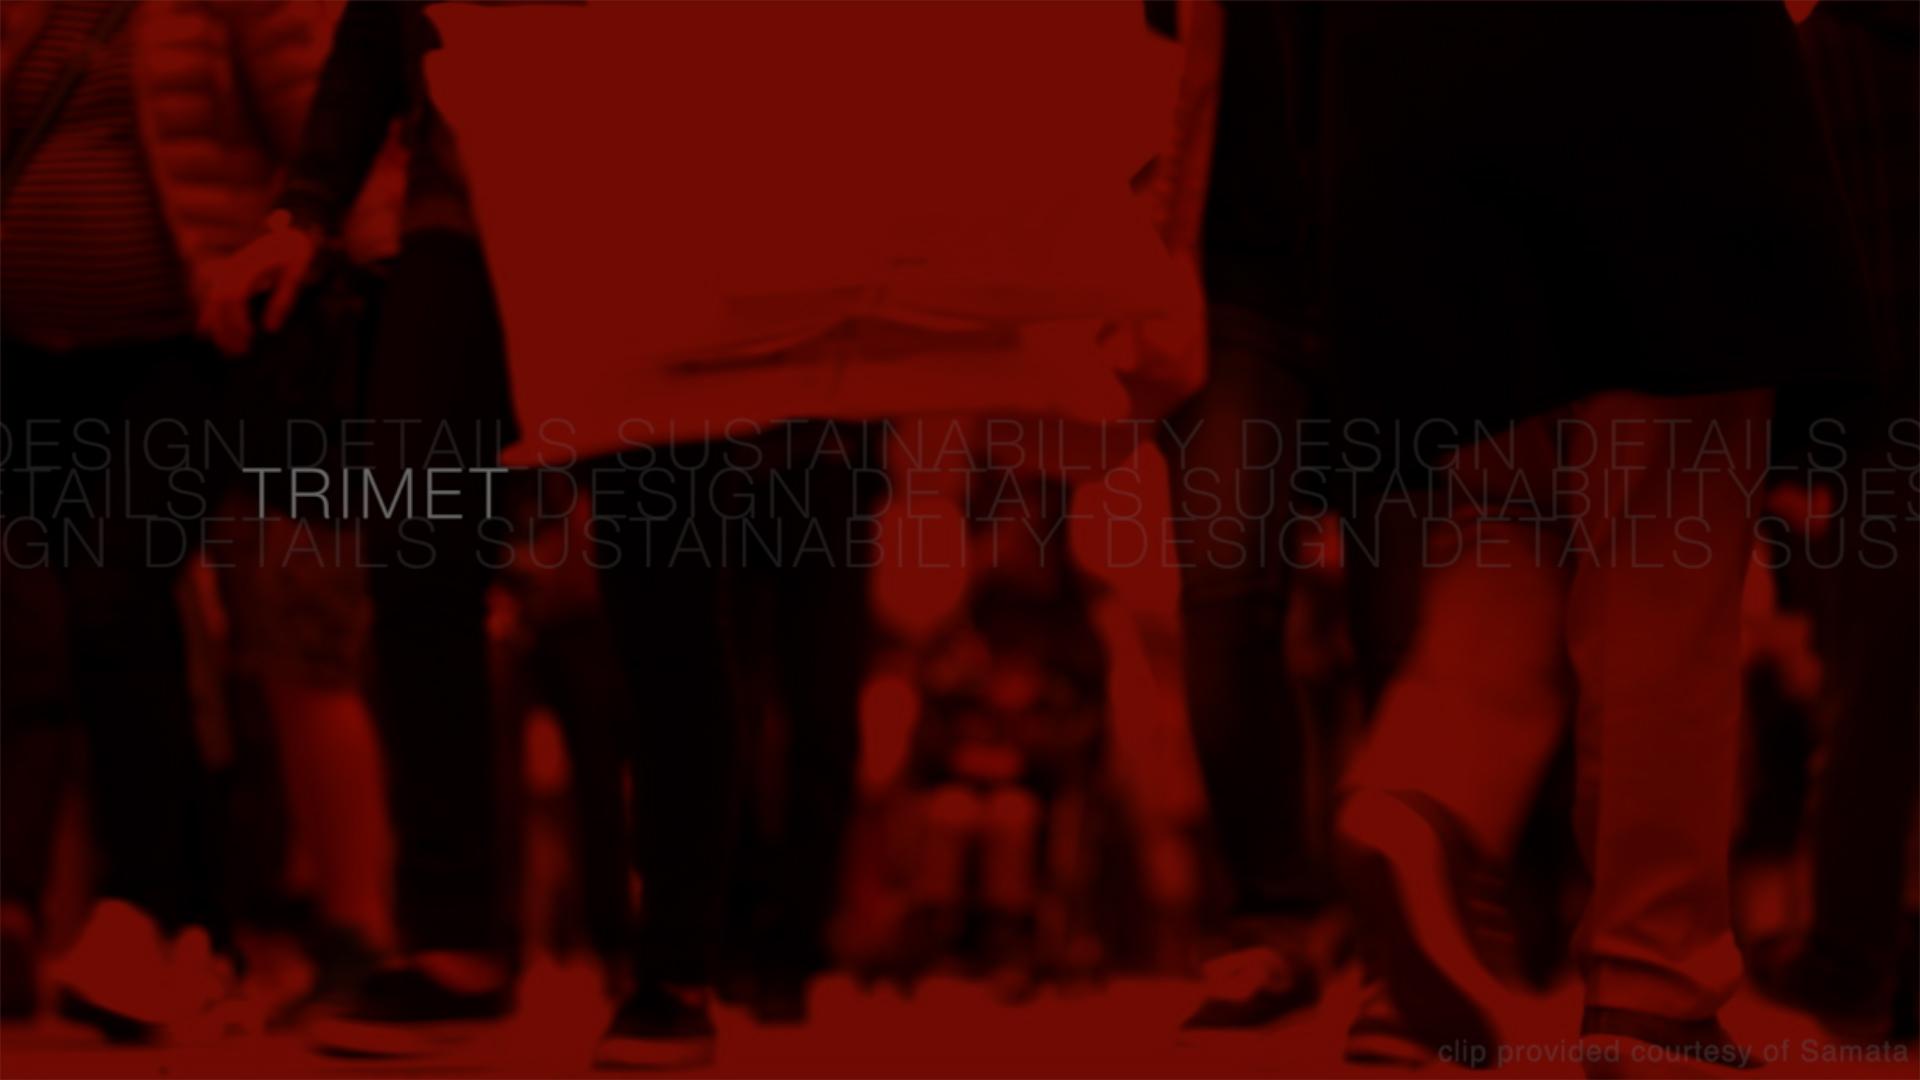 DSP website image 4a